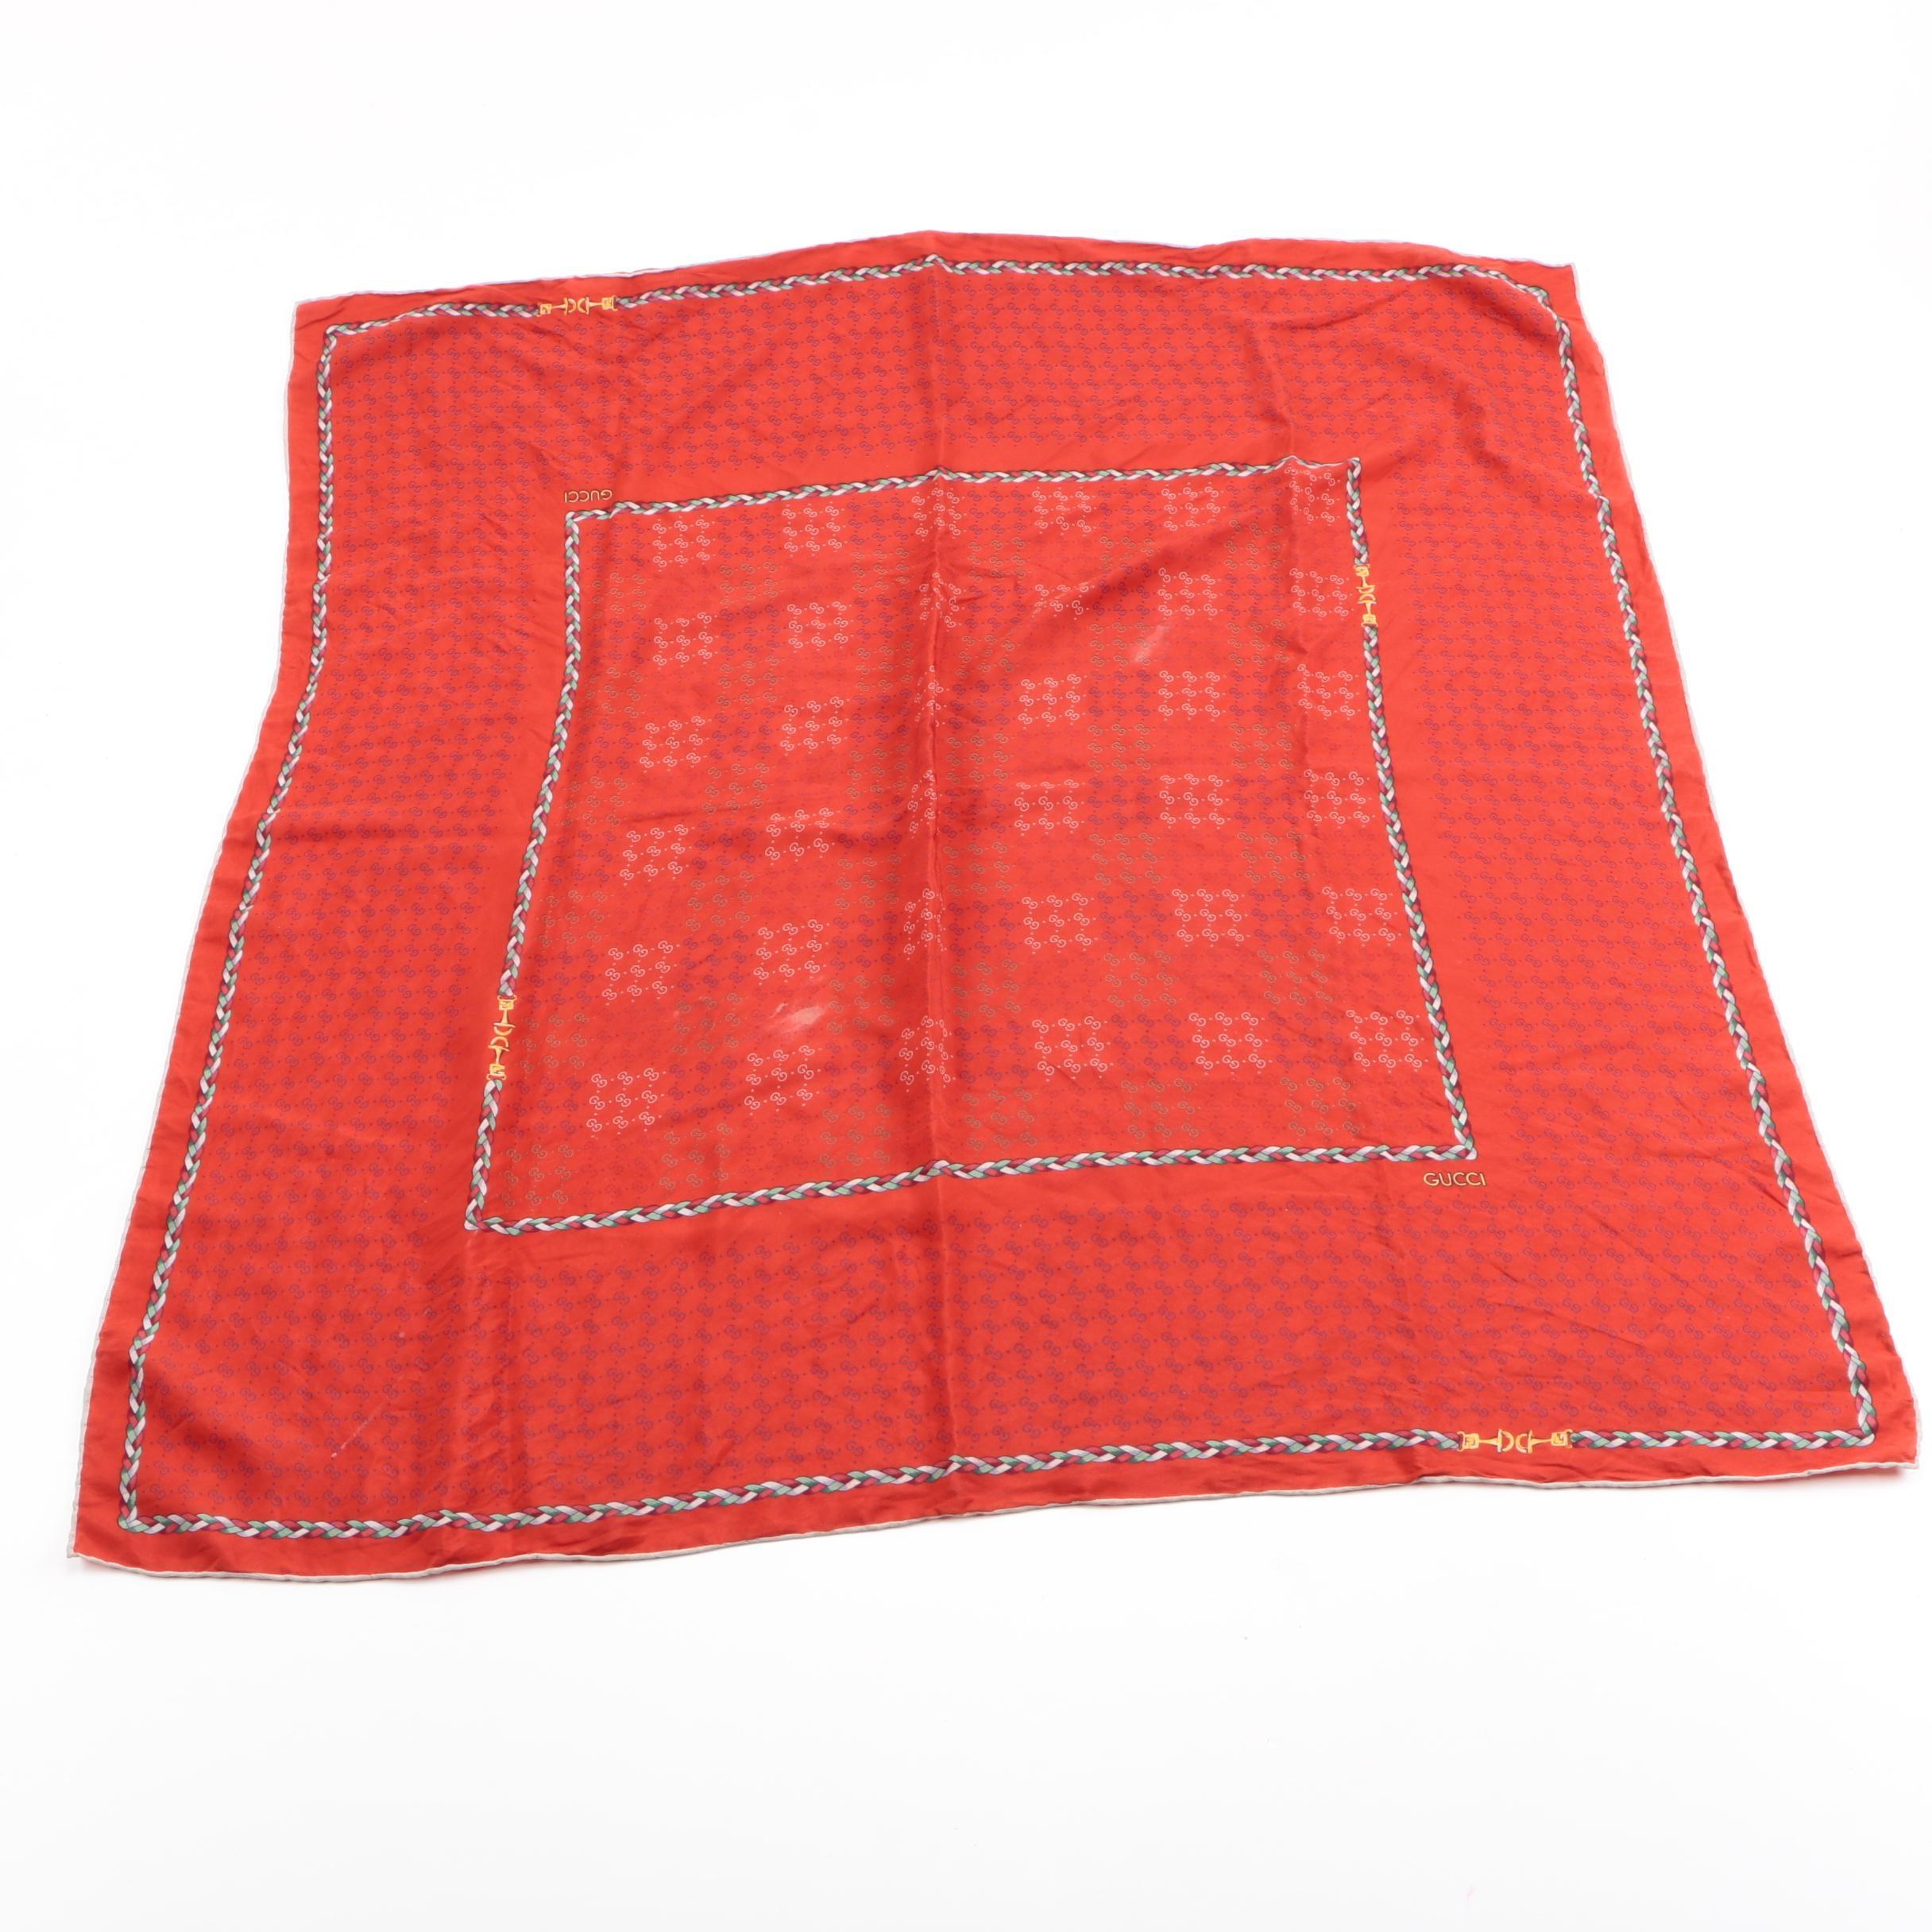 Gucci Red Silk Scarf